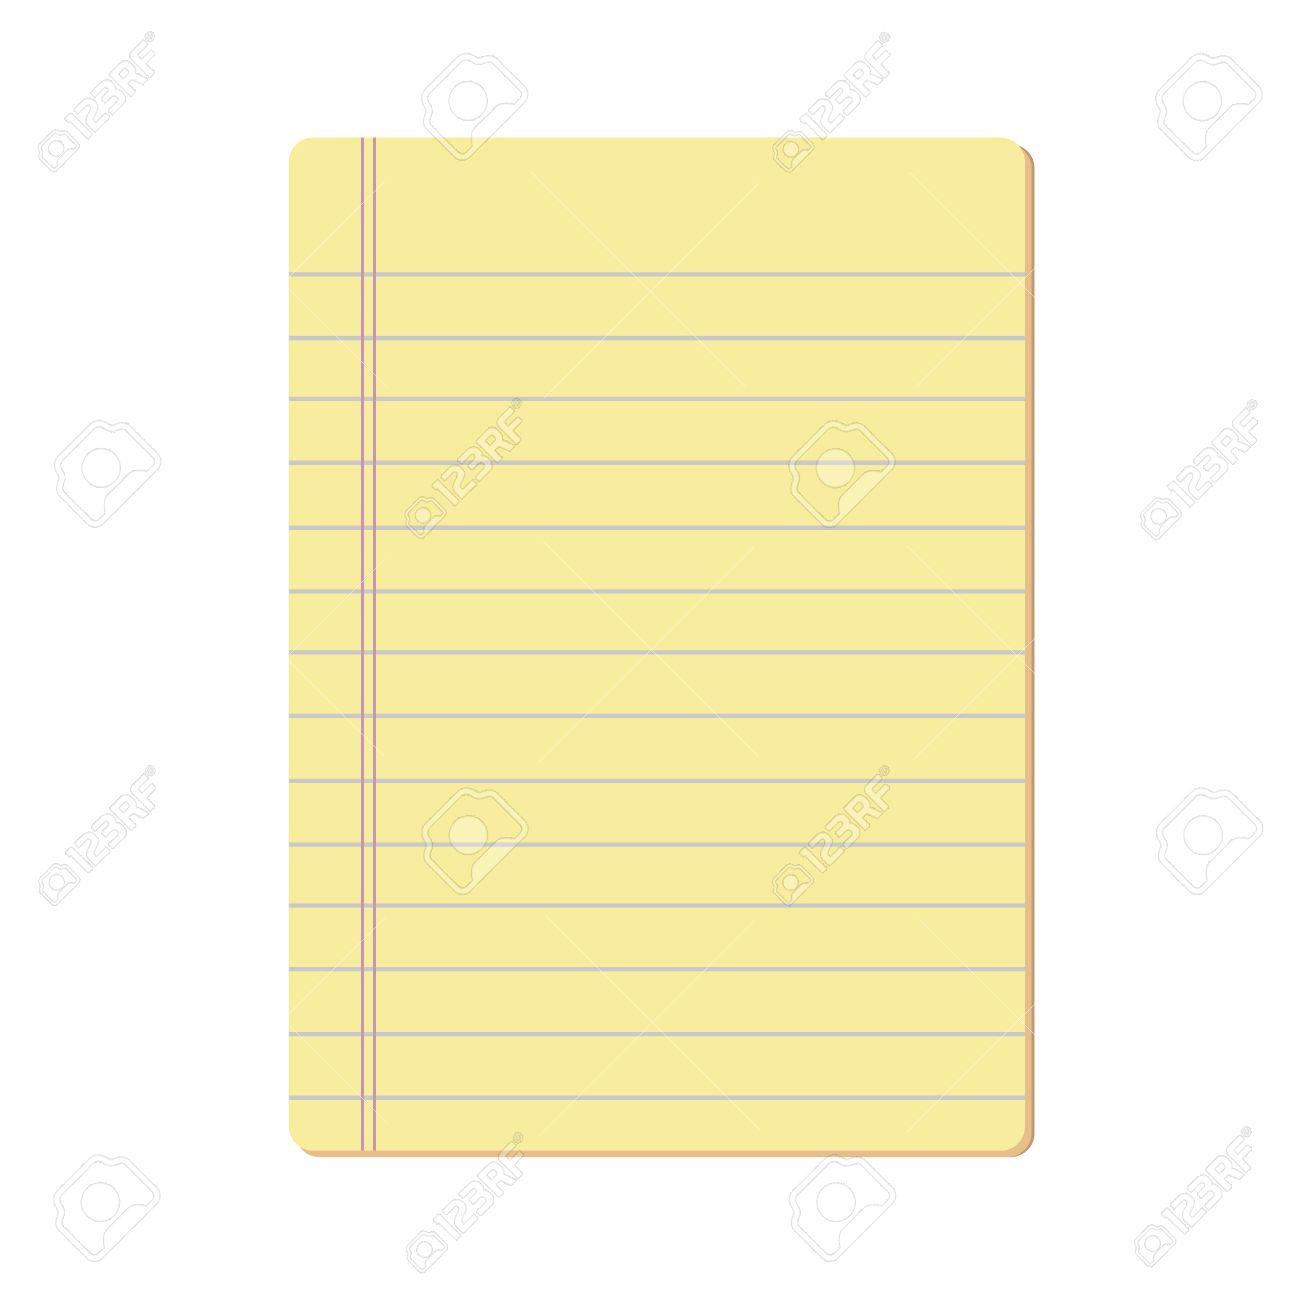 blank notepad vector royalty free cliparts vectors and stock